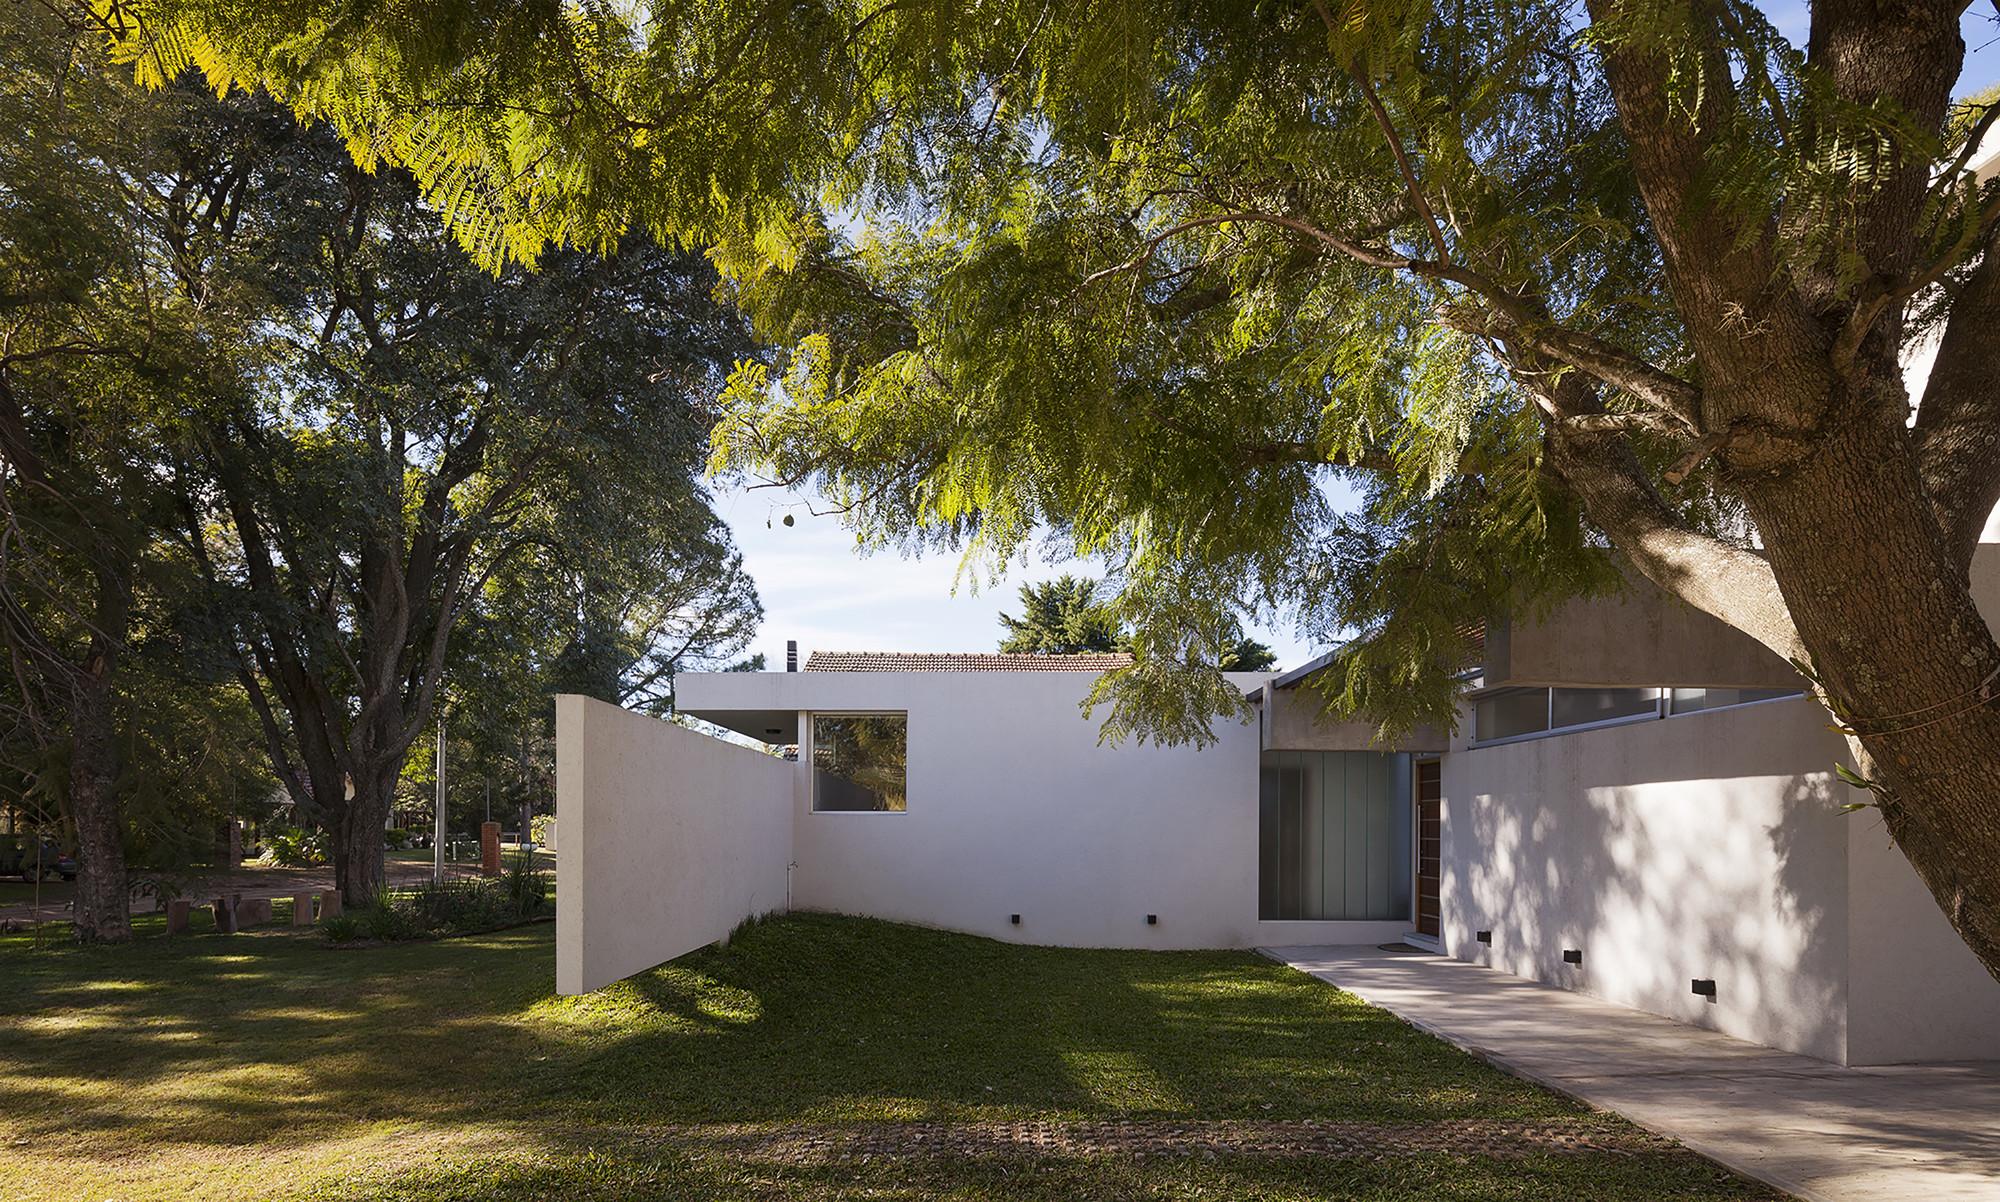 Lottersberger House / Estudio Irigoyen, Navarro Arquitectos, © Federico Cairoli